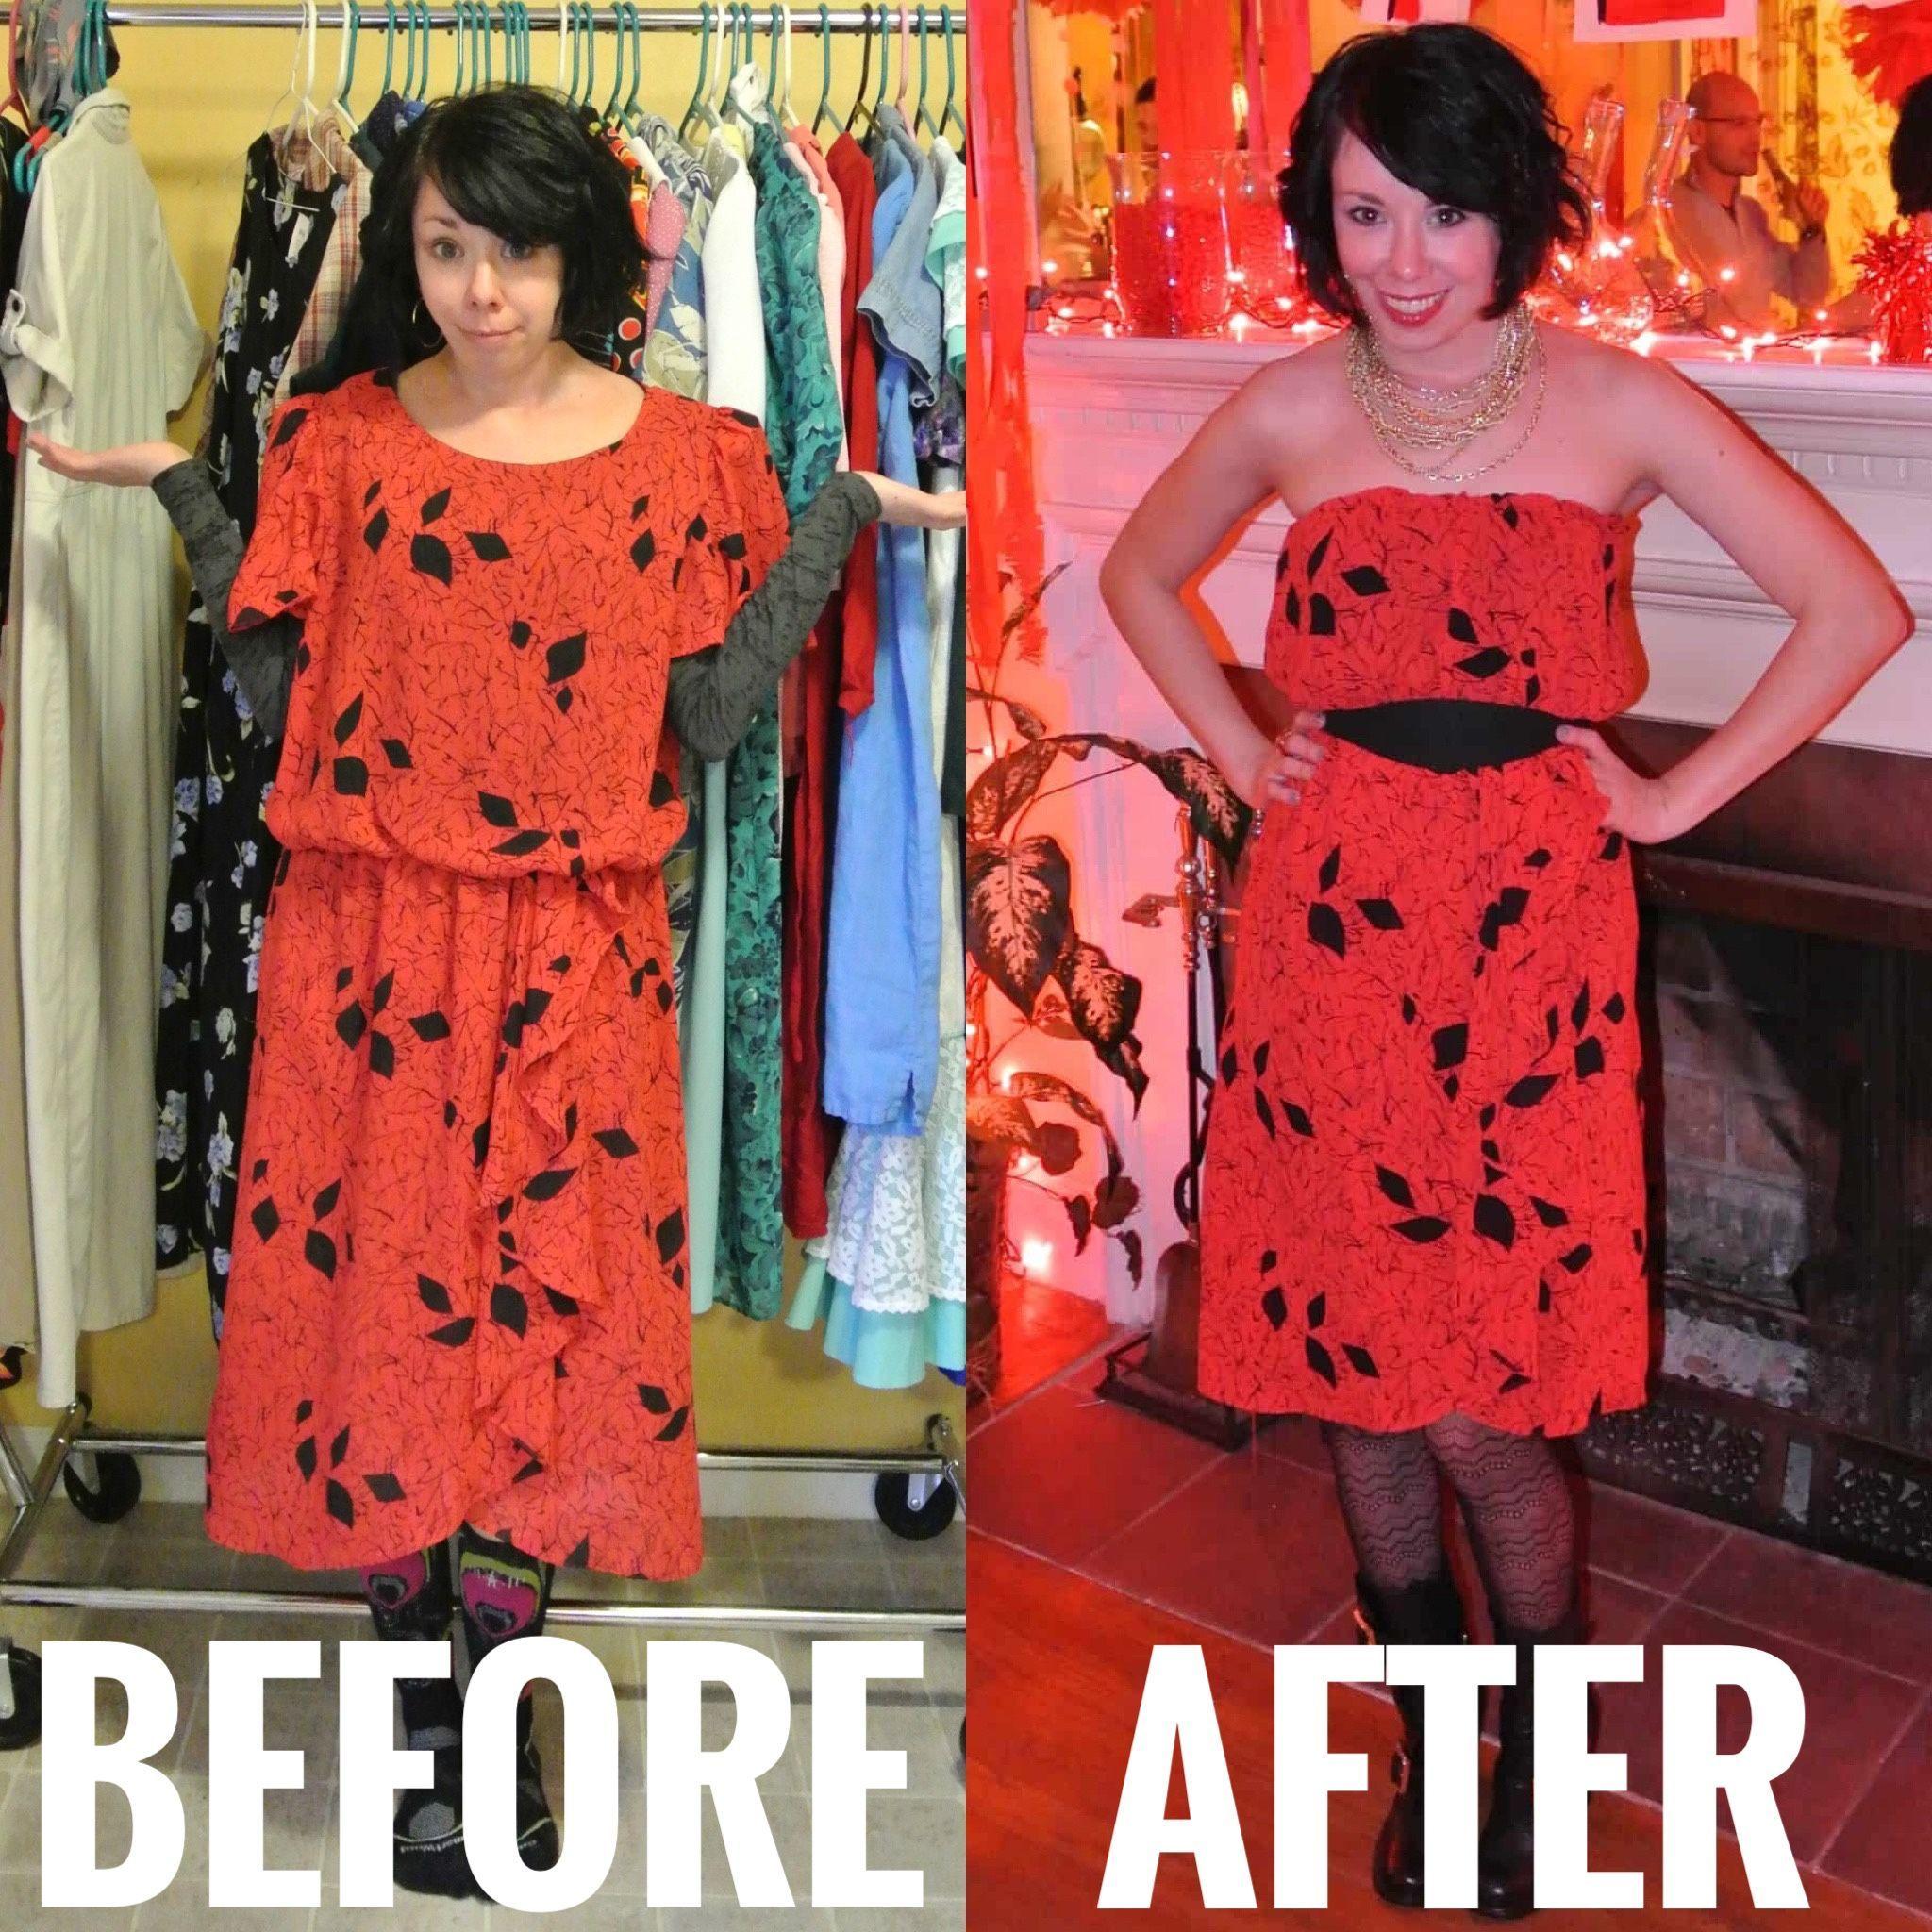 A Strapless Dress Diy A Breakup Refashionista In 2020 Diy Dress Cute Strapless Dresses Dresses